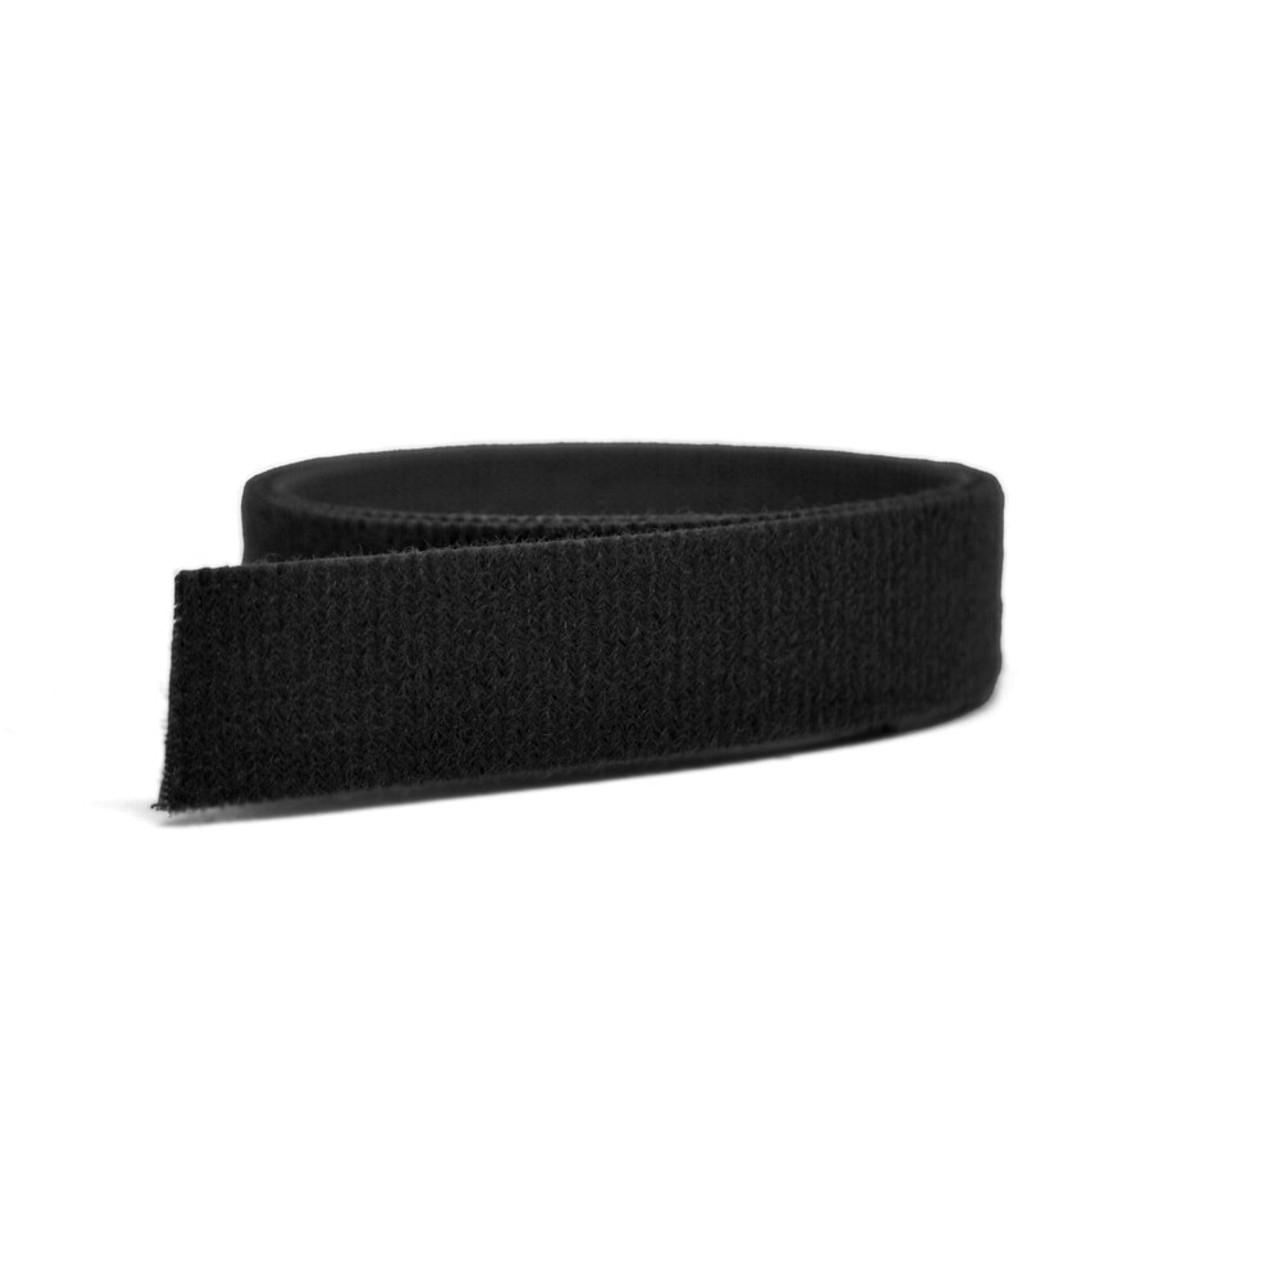 "VELCRO® ONE-WRAP® MIL SPEC Tape - 1"" Black / Velcro Straps - Bundling Straps - Velcro Tie - Velcro Strap"